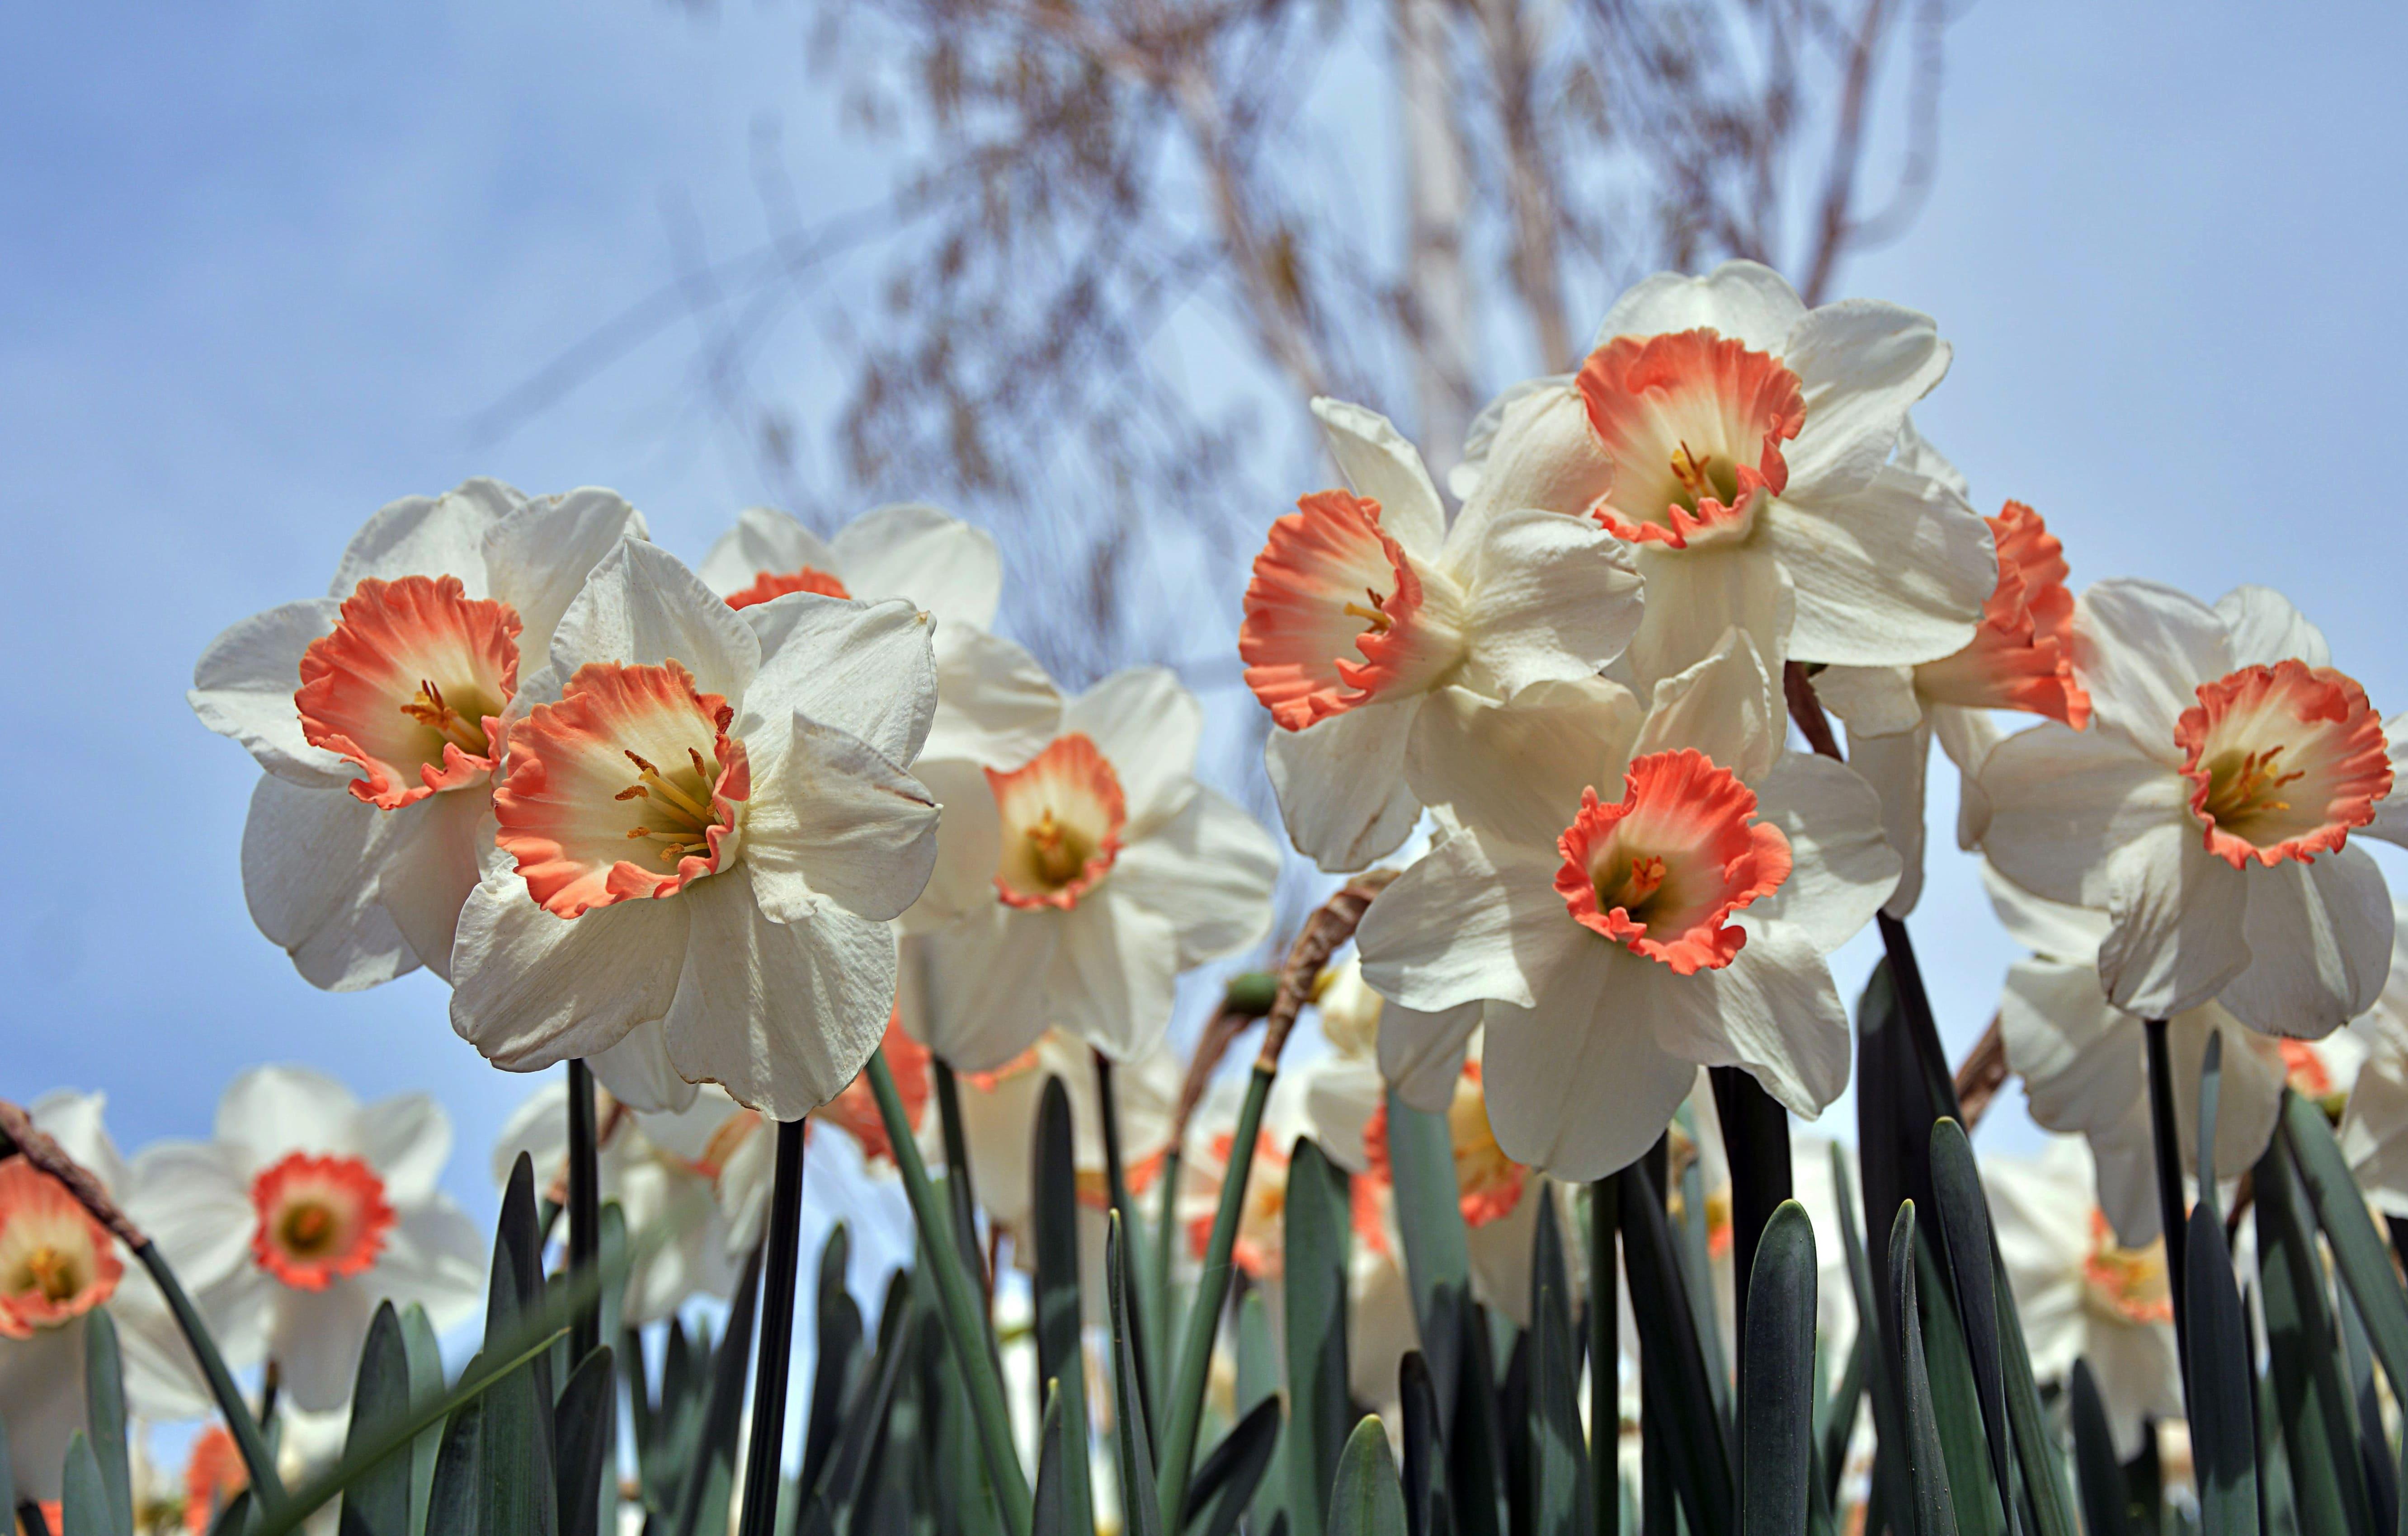 daffodils-photo-46